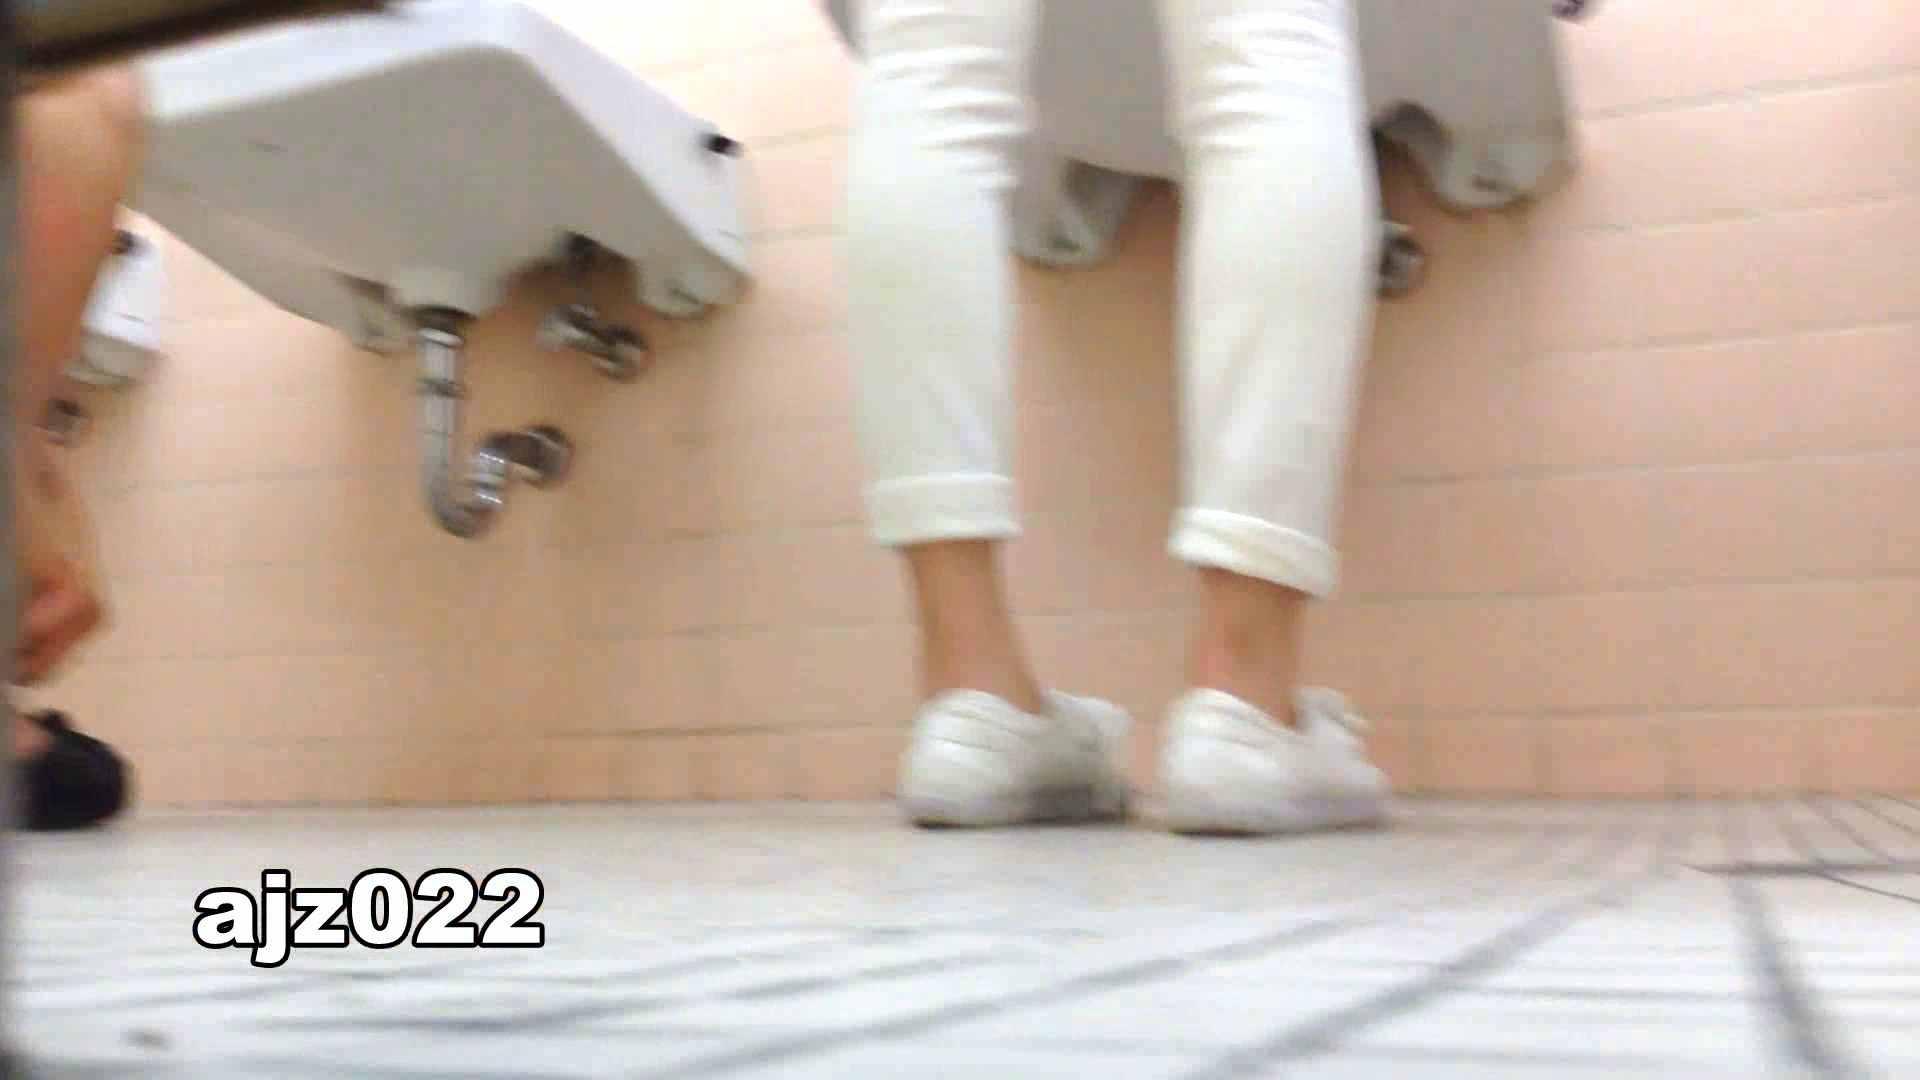 某有名大学女性洗面所 vol.22 洗面所 オメコ動画キャプチャ 94連発 43